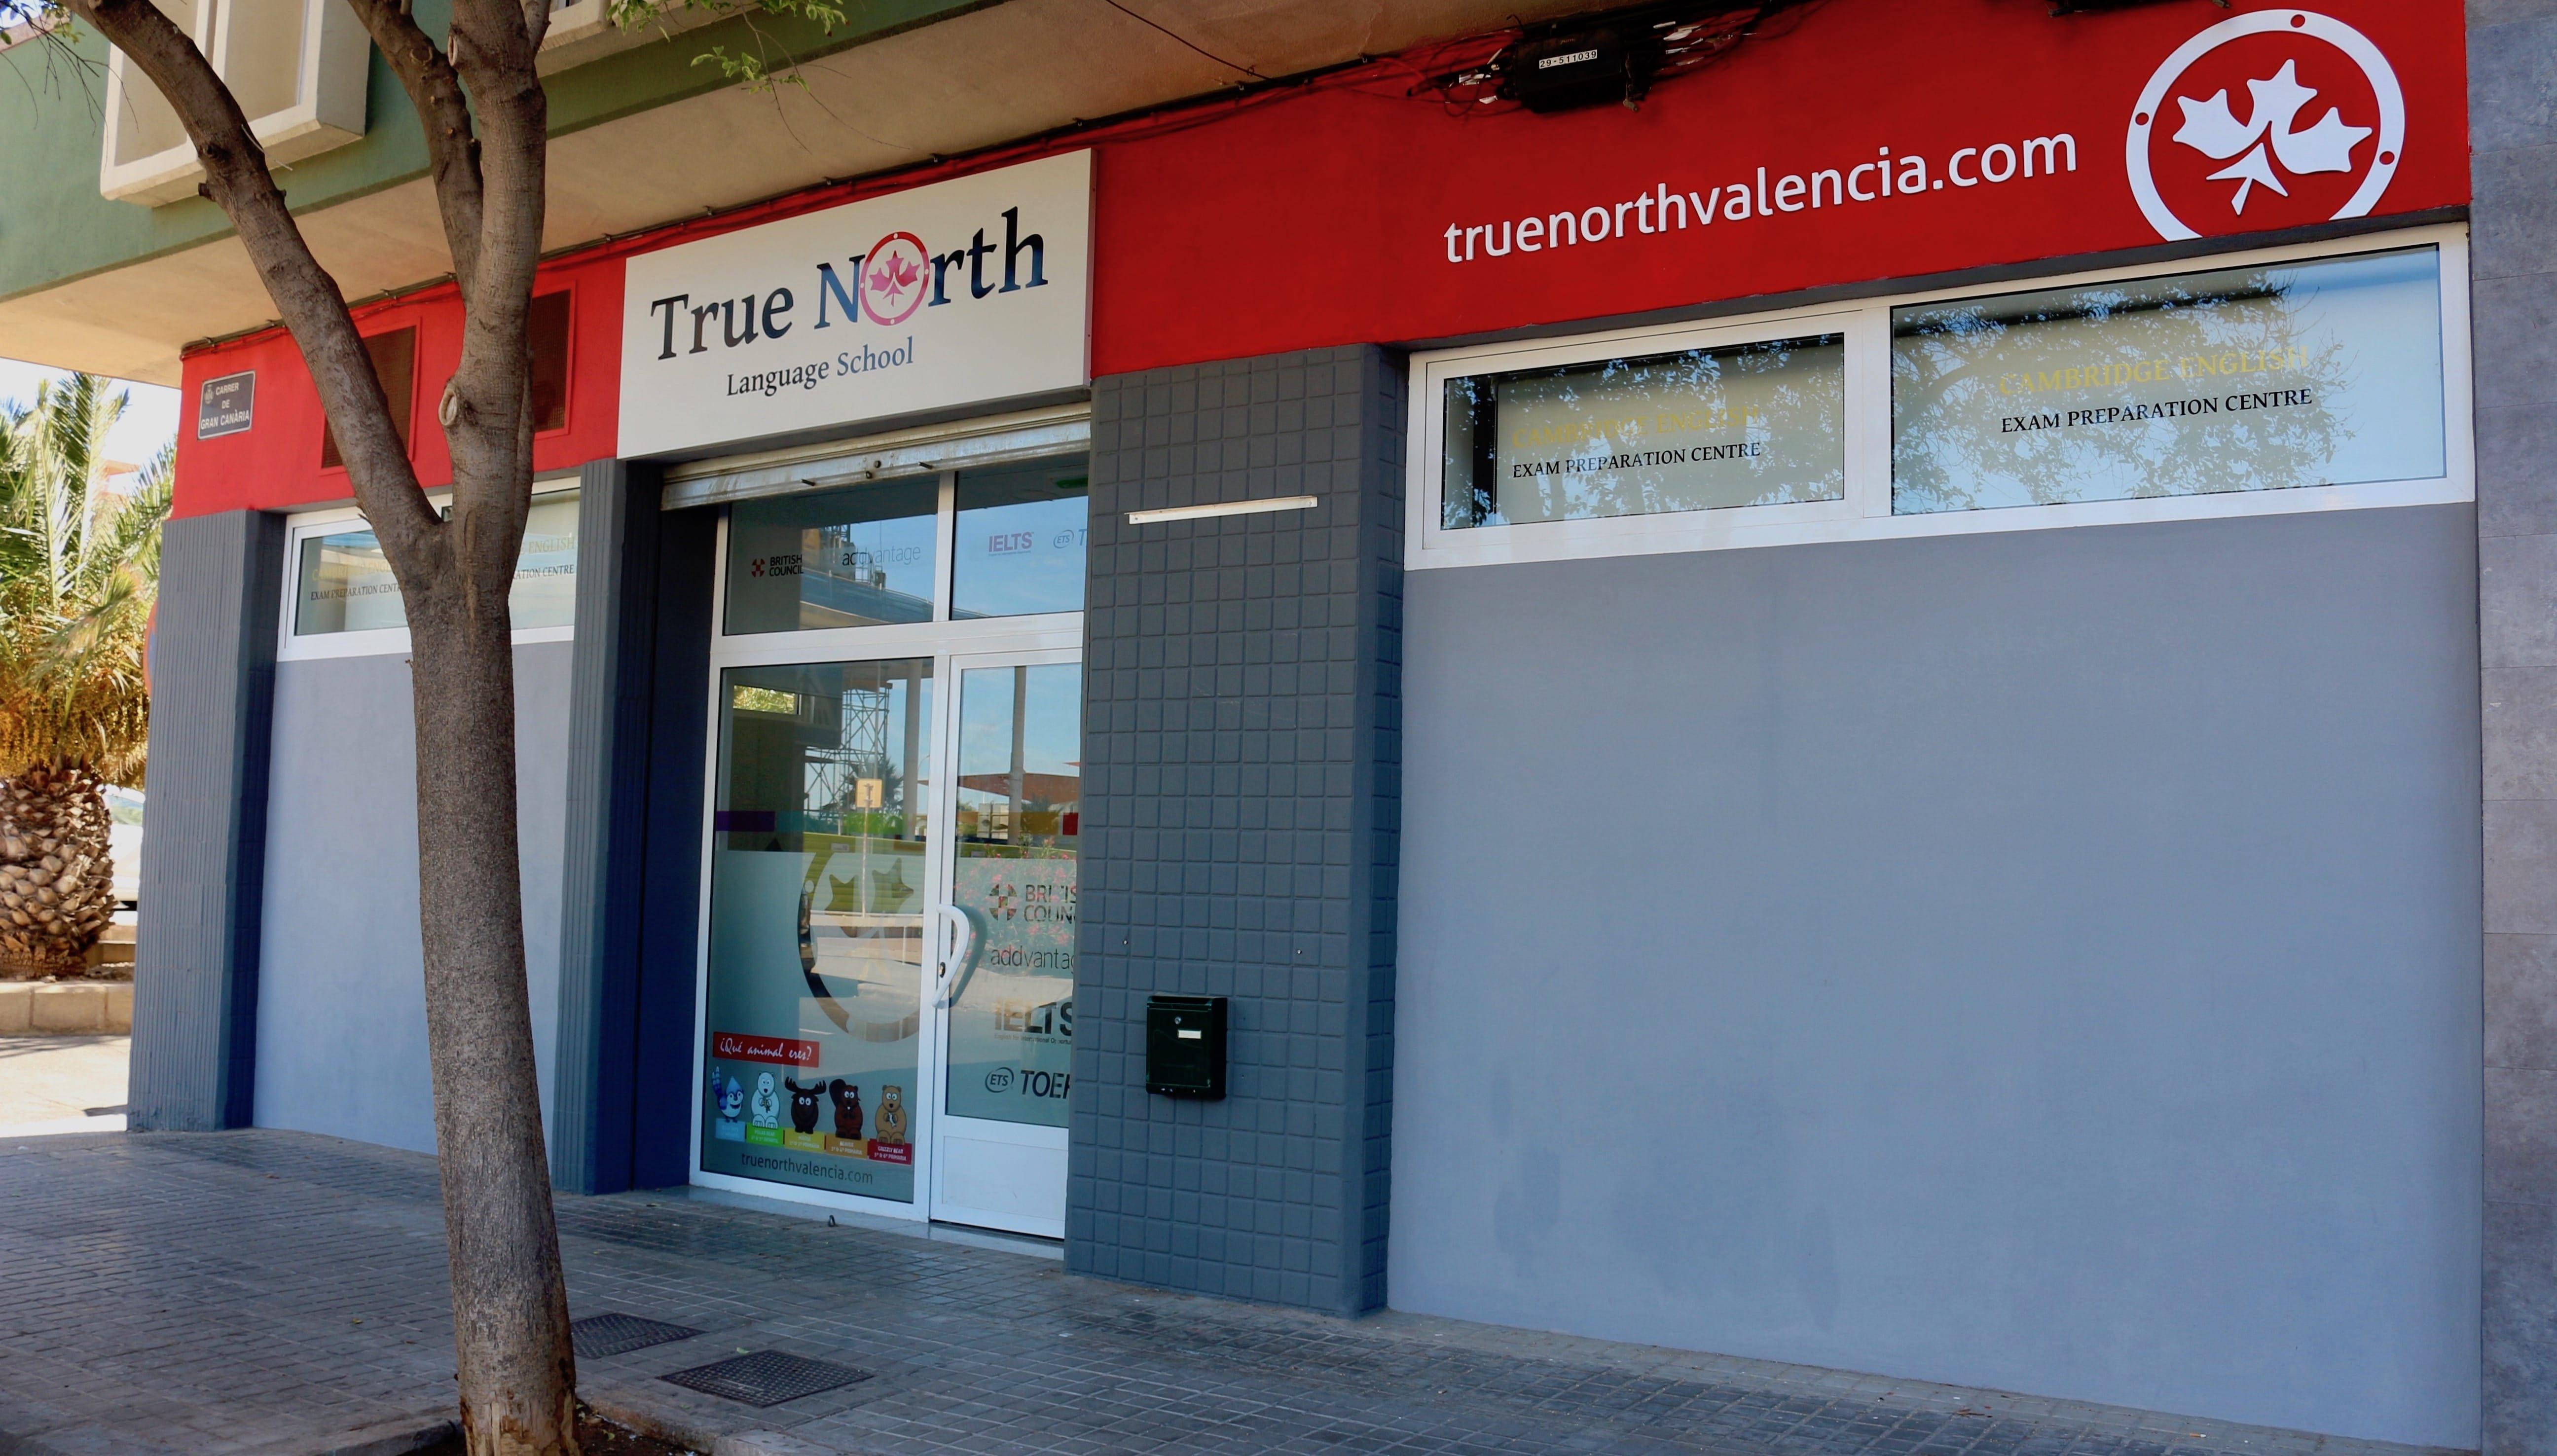 True North Language School